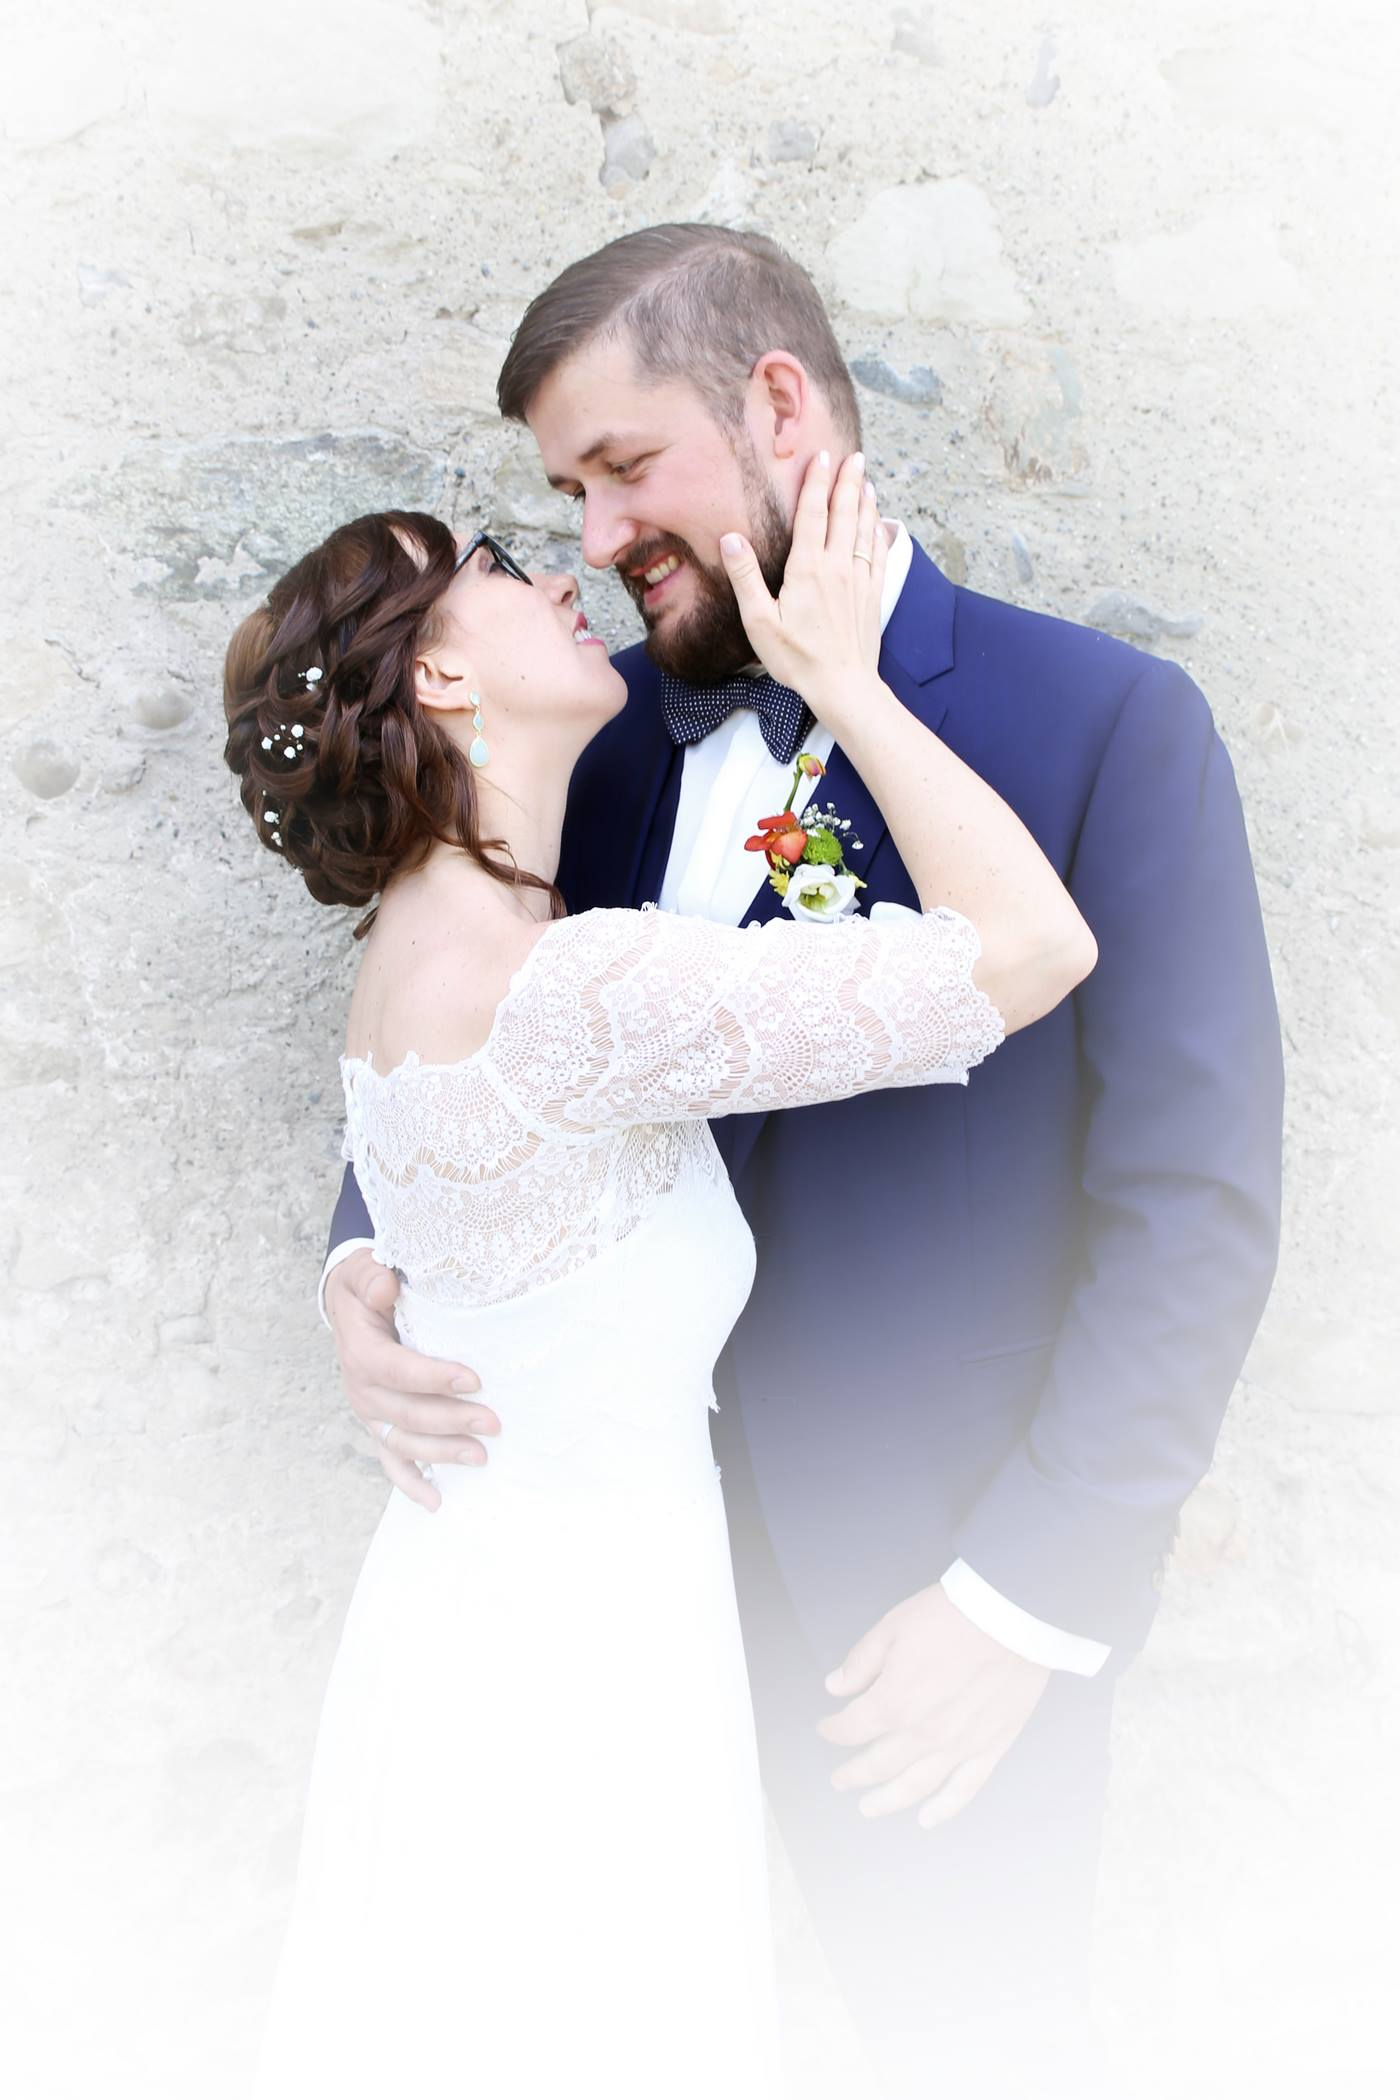 Braut hält Hand an Wange vom Bräutigam